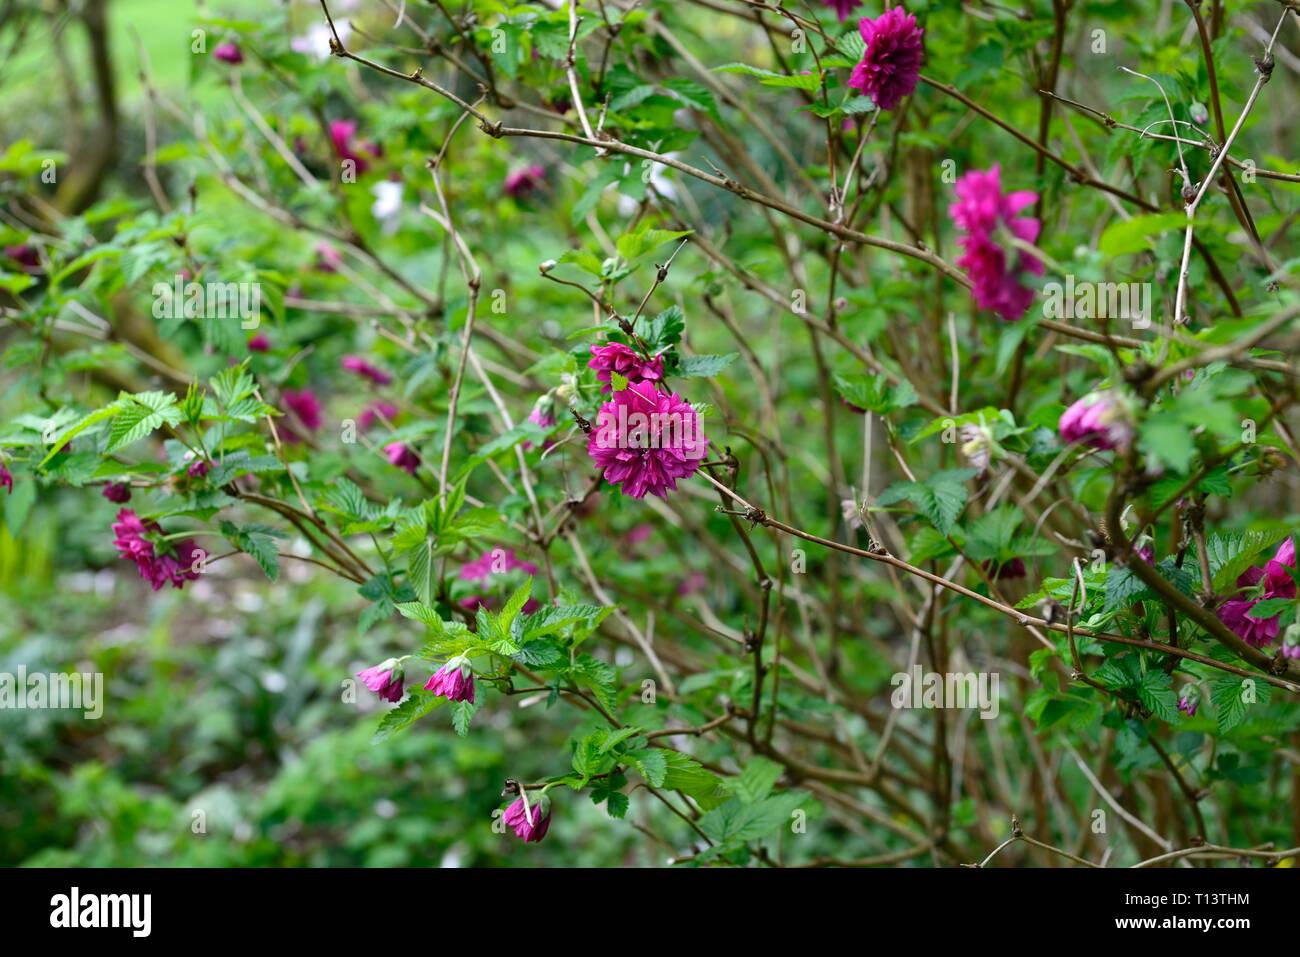 rubus spectabilis olympic double,flore pleno,salmonberry,purple-pink,flower,flowers,flowering,thicket forming,shrubs,shrub,spring,flower,flowers,flowe Stock Photo